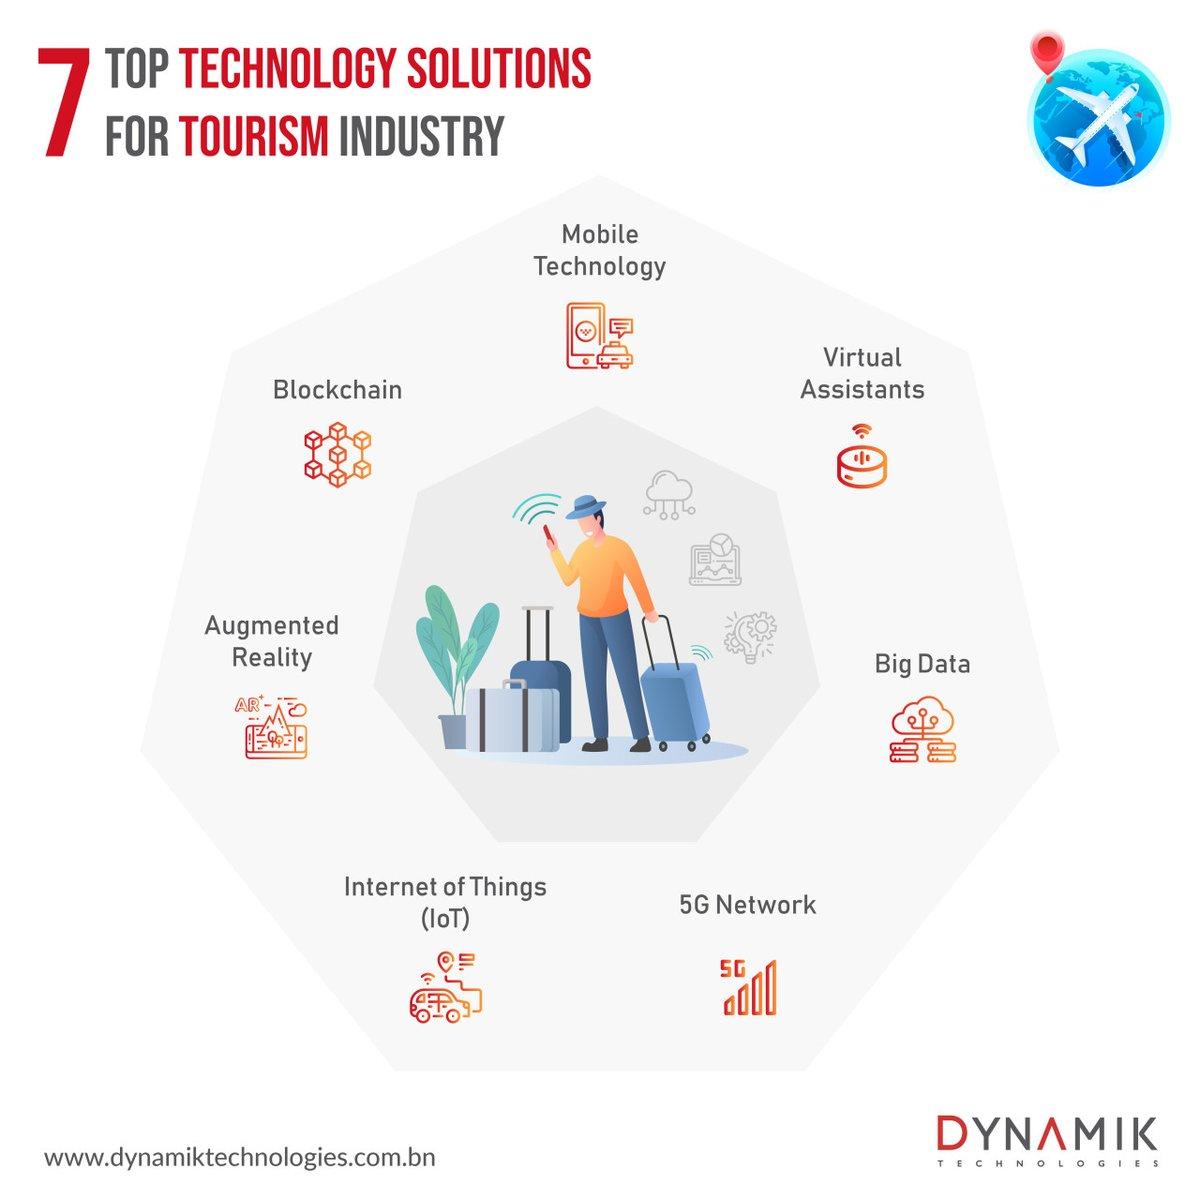 In today's digital age, technological advances continue to revolutionize ... #Brunei #BruneiDarussalam #DynamikTechnologies #DynamikConsulting #ITConsultant #InformationTechnology #Technology #digital #Future #Tech #IT #Data  #TechnologySolutions #ASEANTourismForum2020 #ASEANpic.twitter.com/Z1pNvAataz